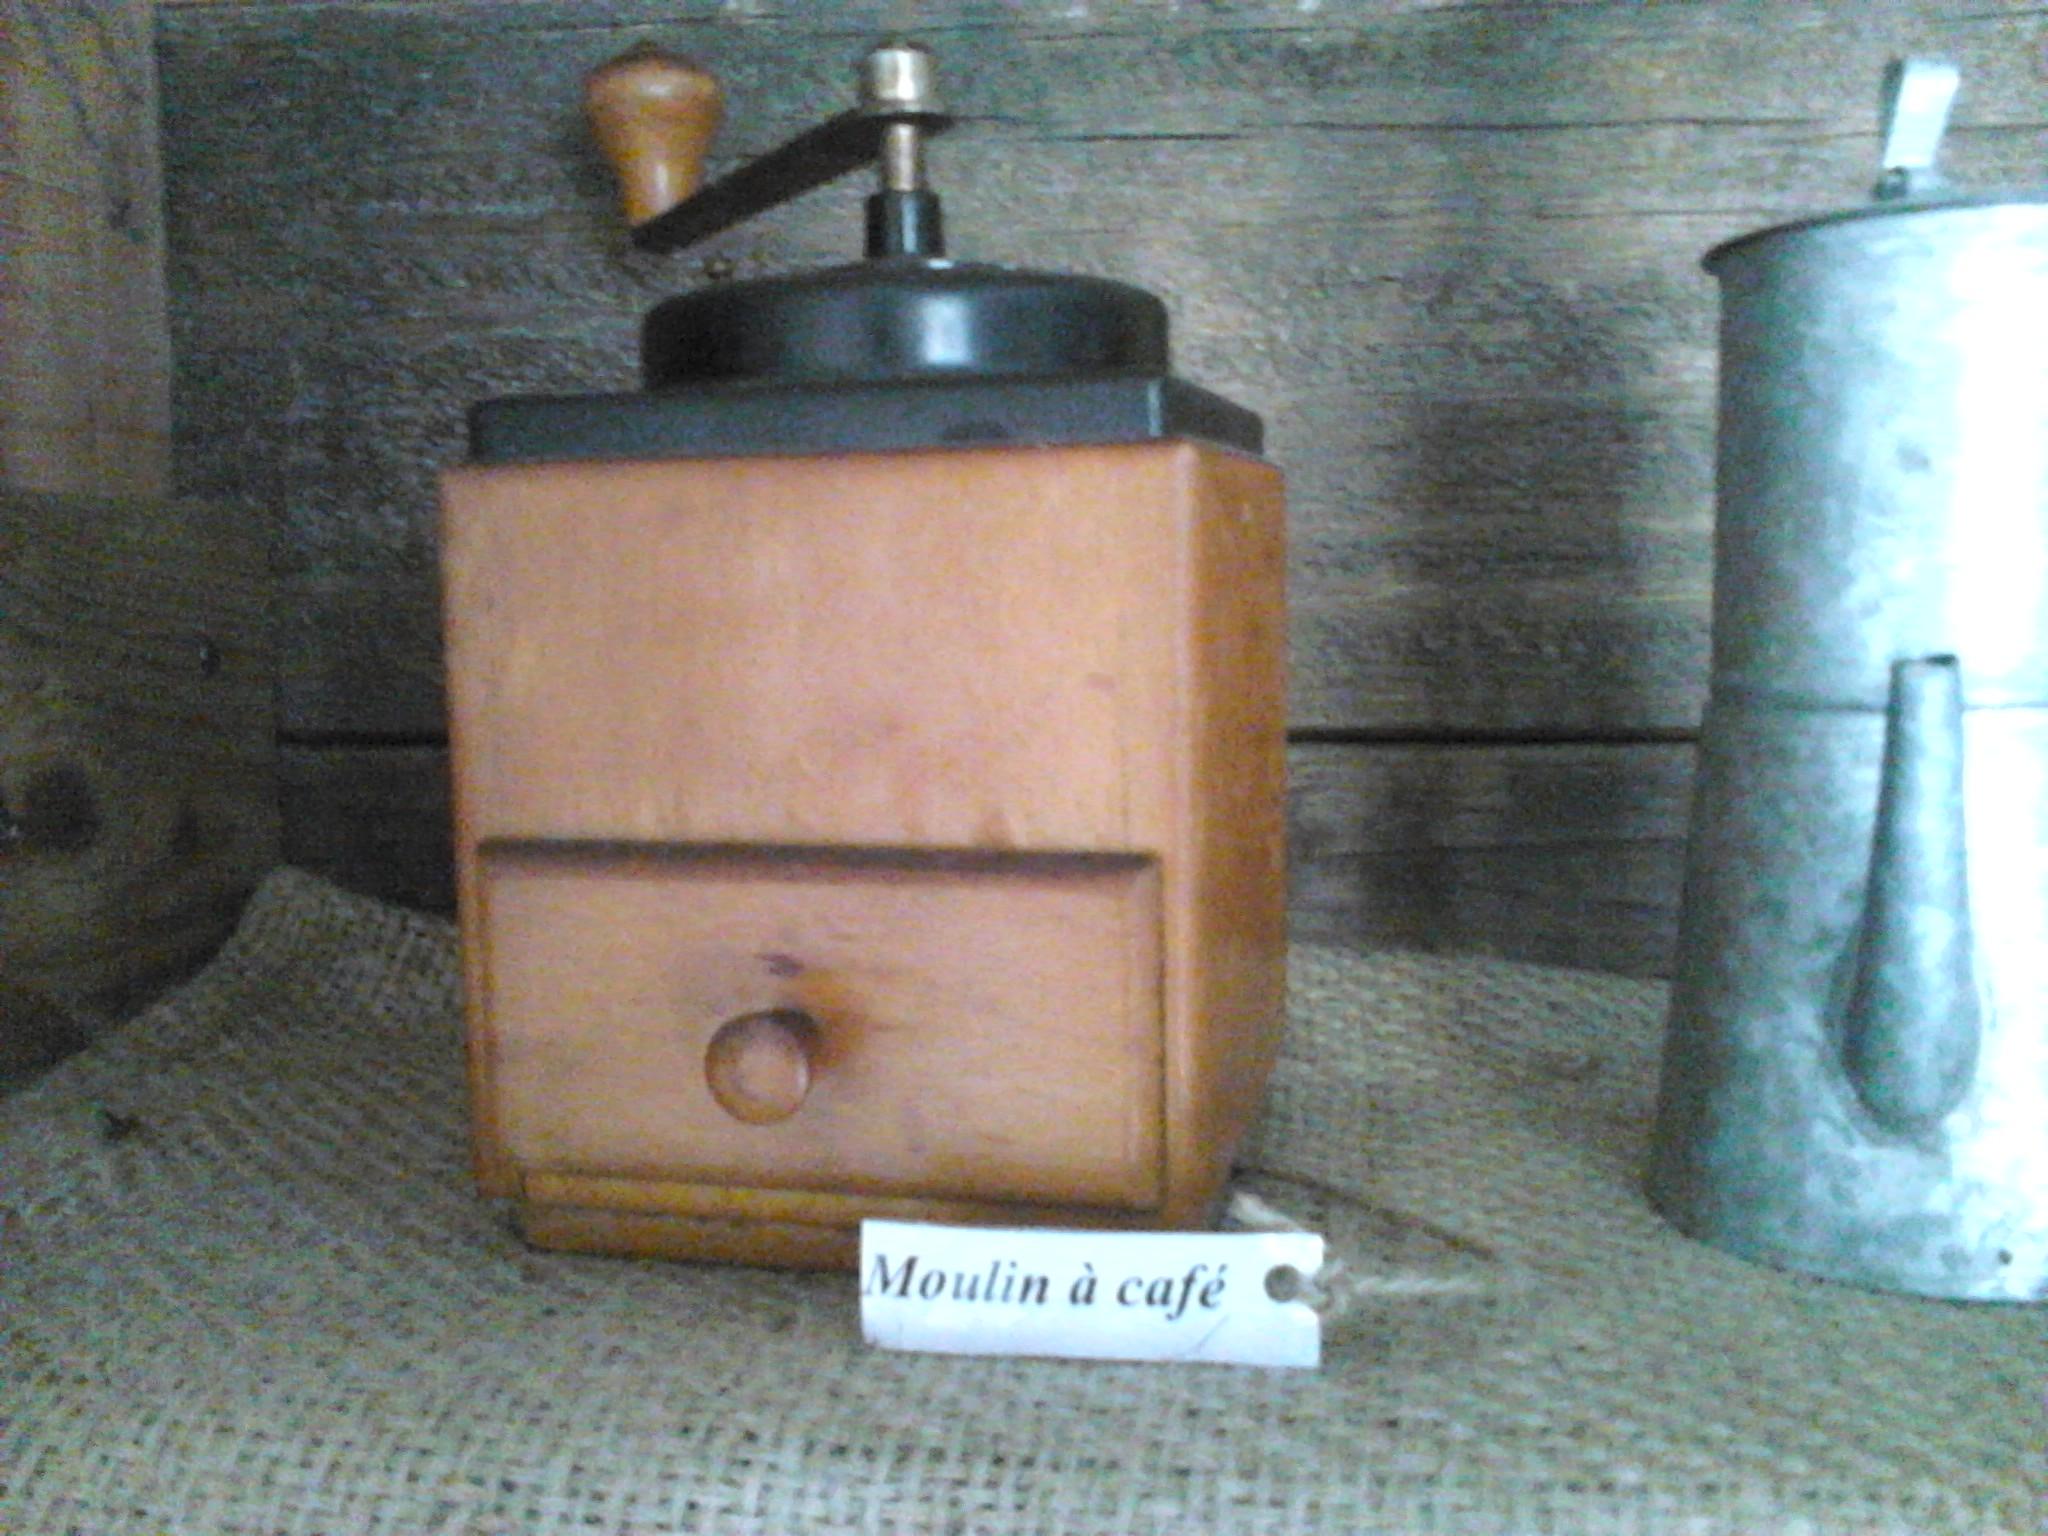 Lampe Avec Un Moulin  Ef Bf Bd Caf Ef Bf Bd